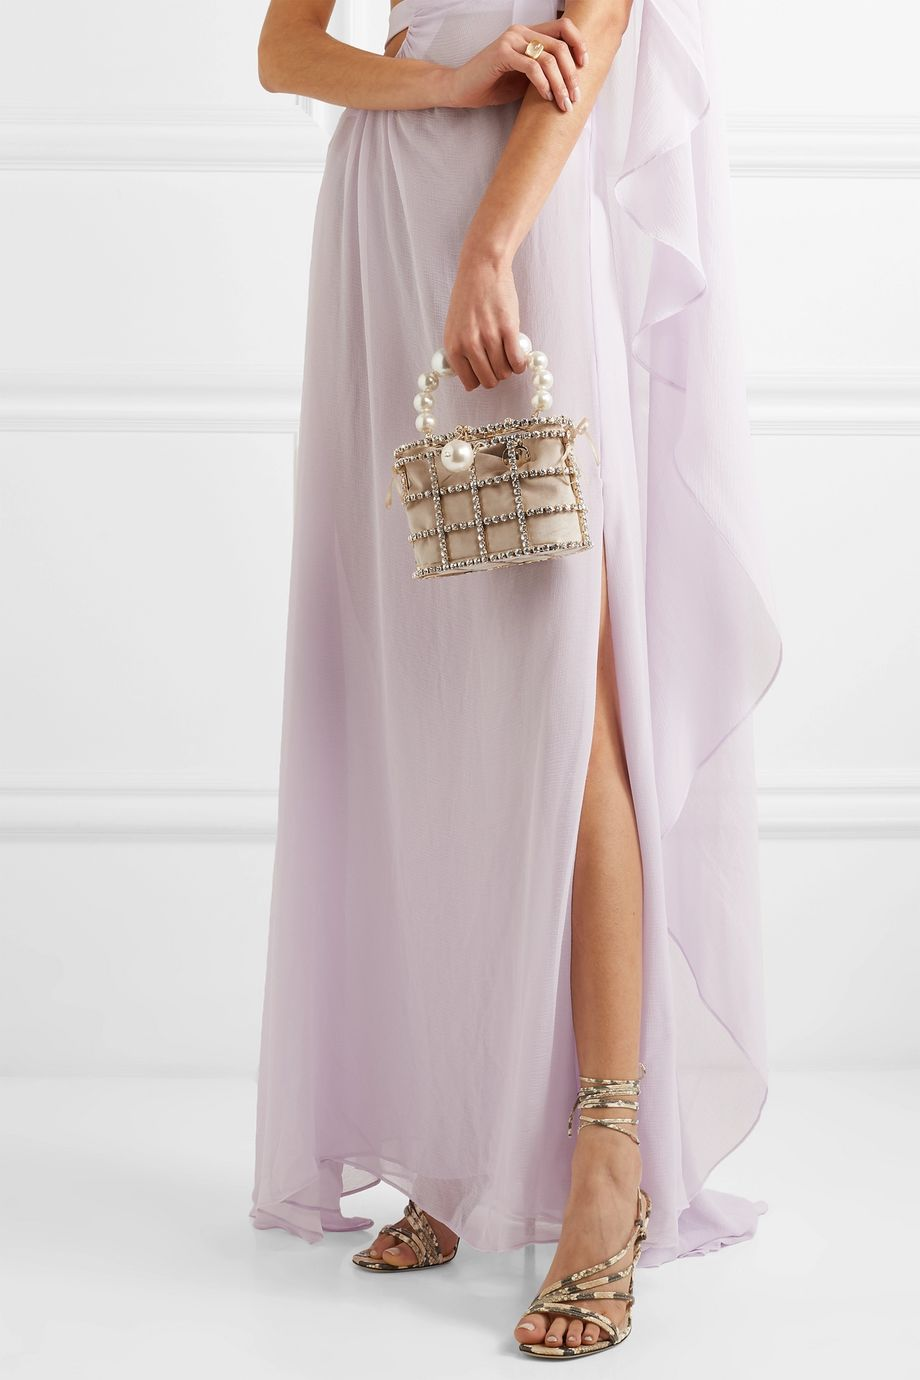 Rosantica Holli embellished gold-tone and velvet tote